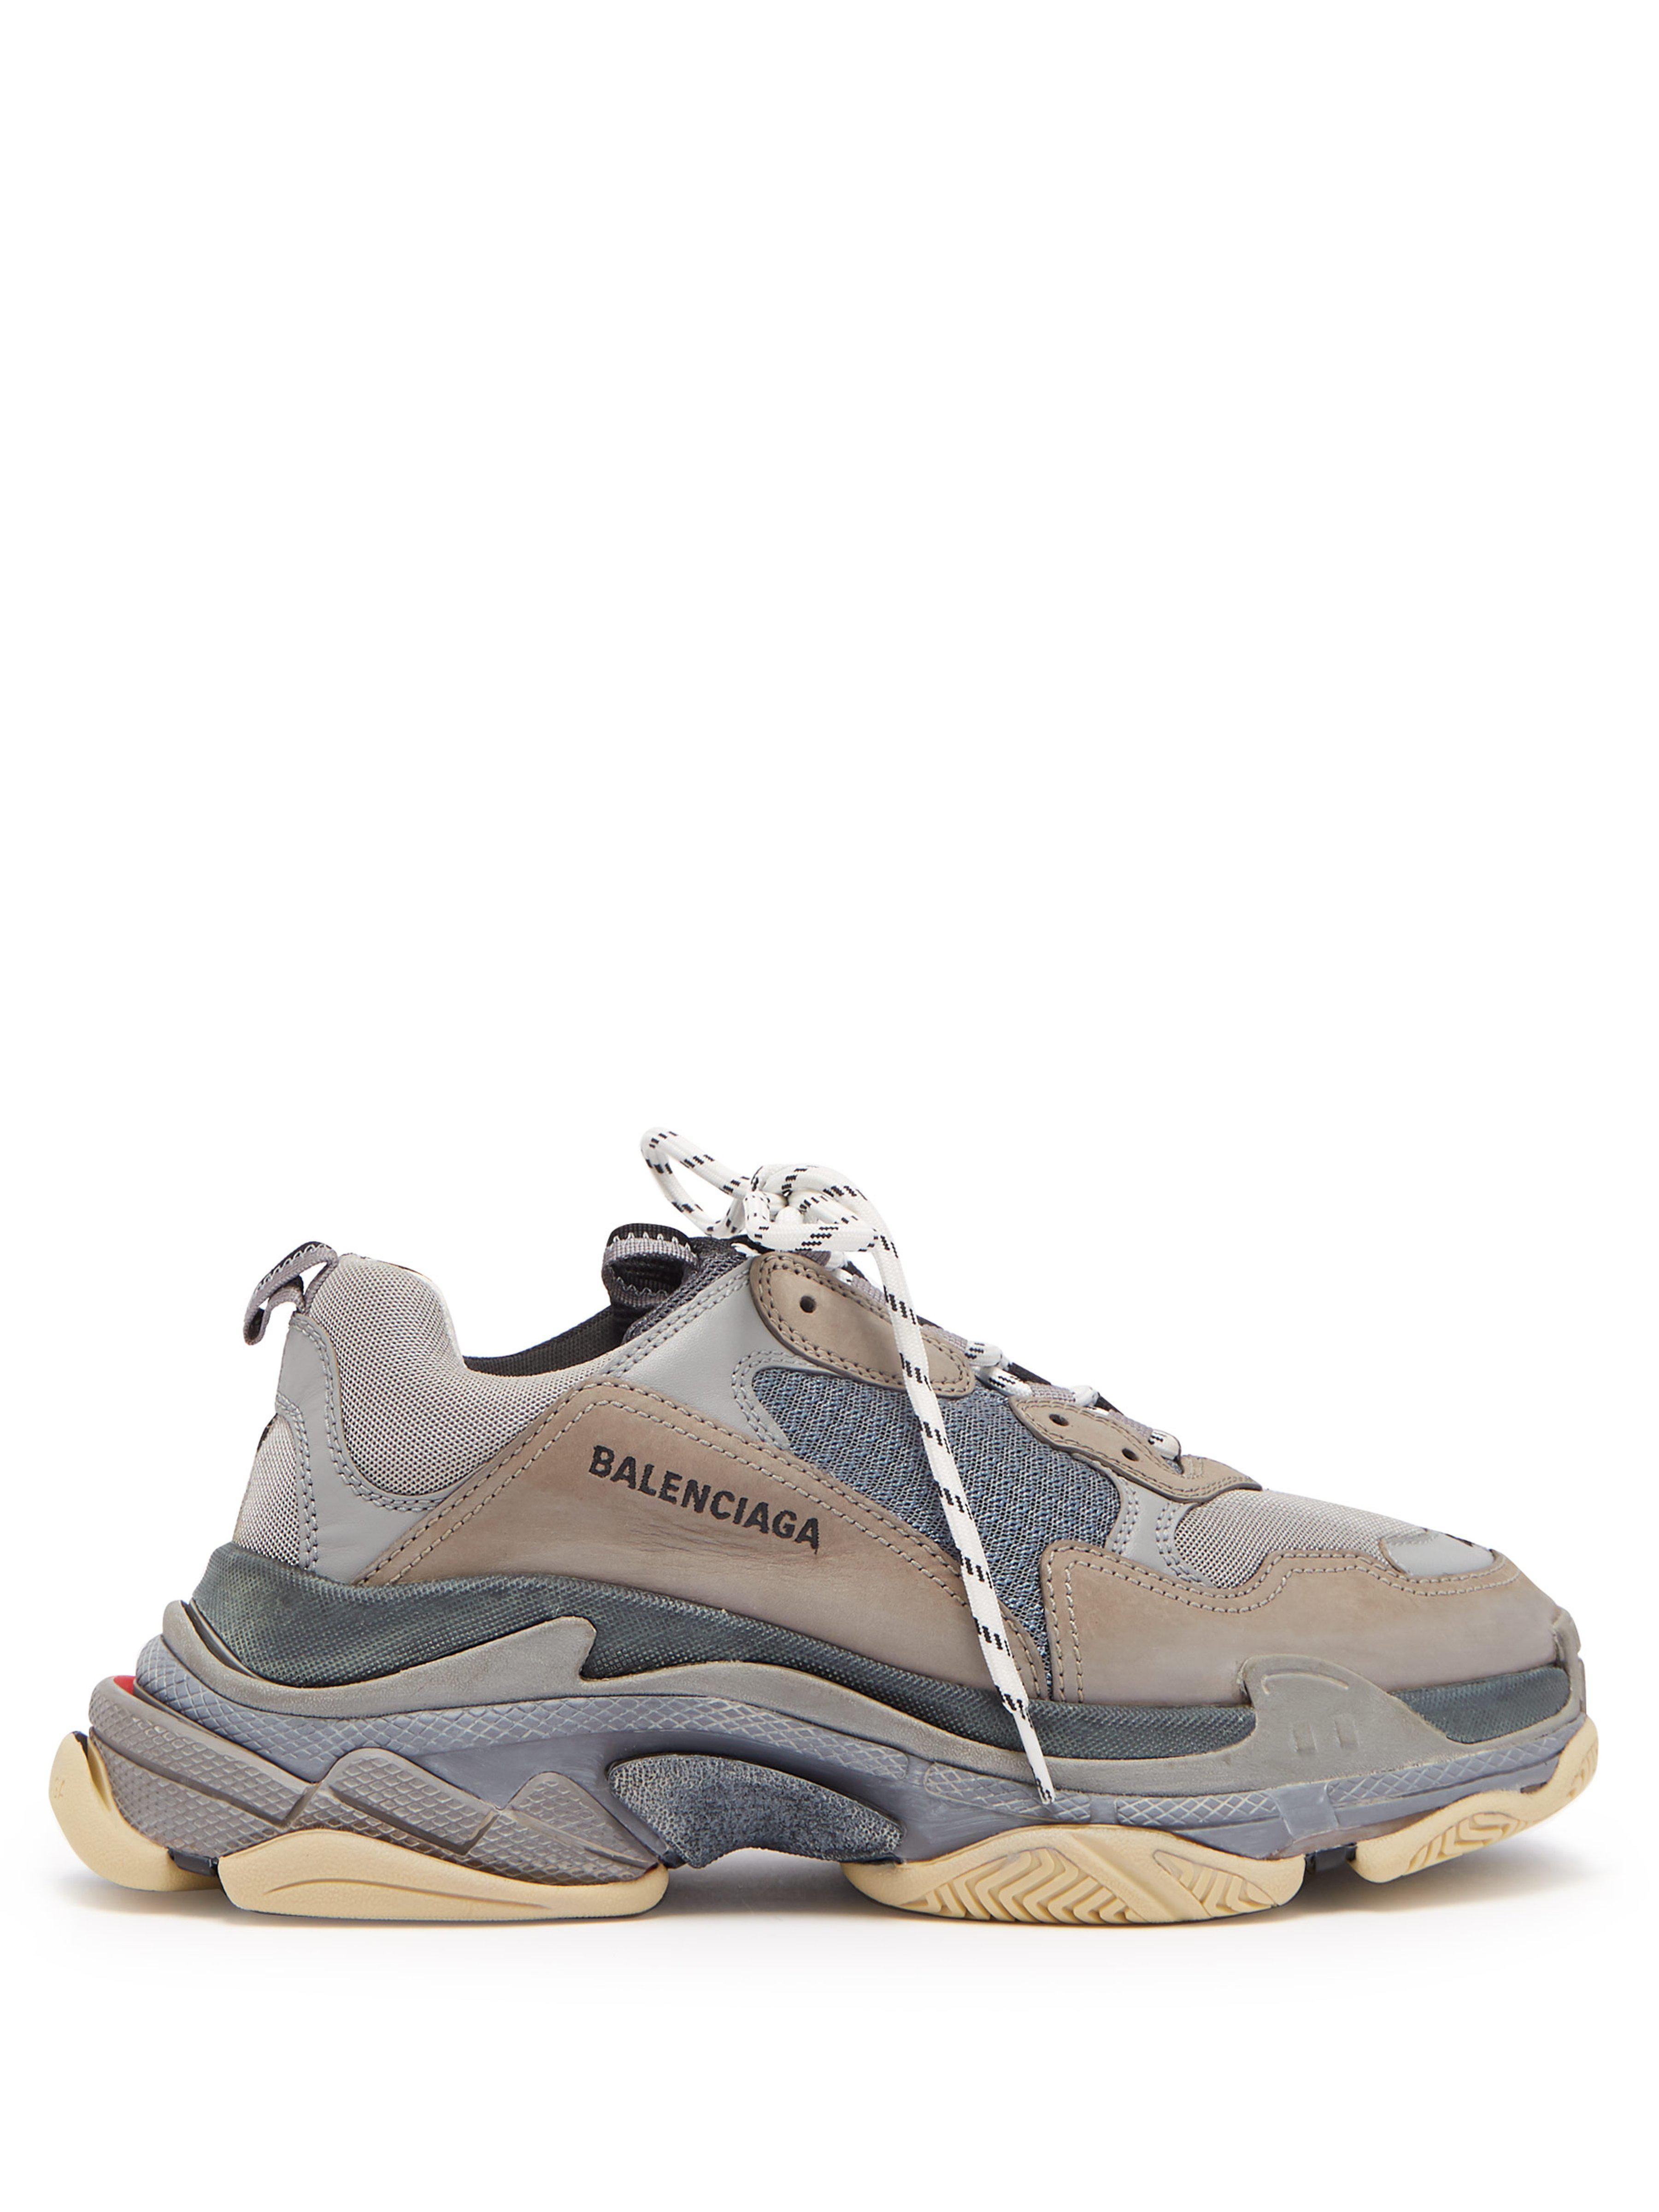 aadd2ba4283f90 Balenciaga - Gray Men s Triple S Trainer Sneakers - Grey Black - Size 39 (6.  View fullscreen